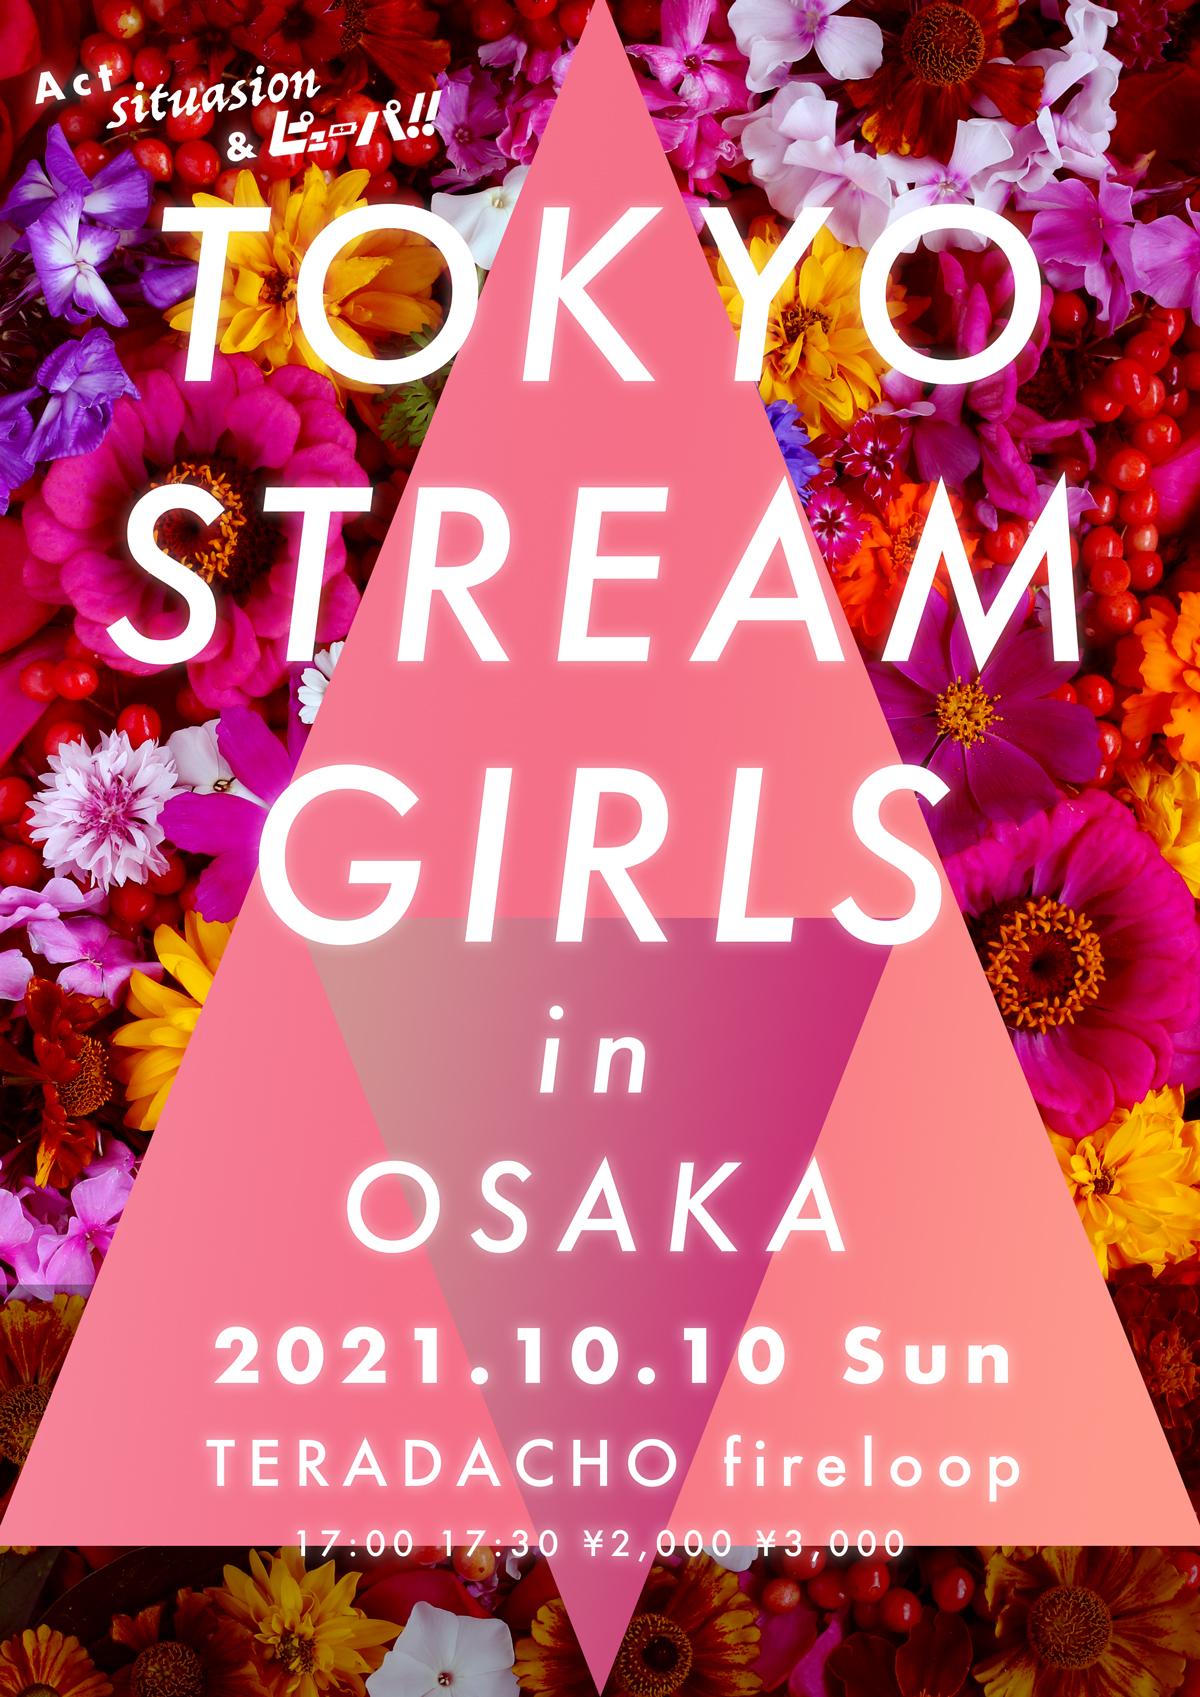 TOKYO STREAM GIRLS in OSAKA